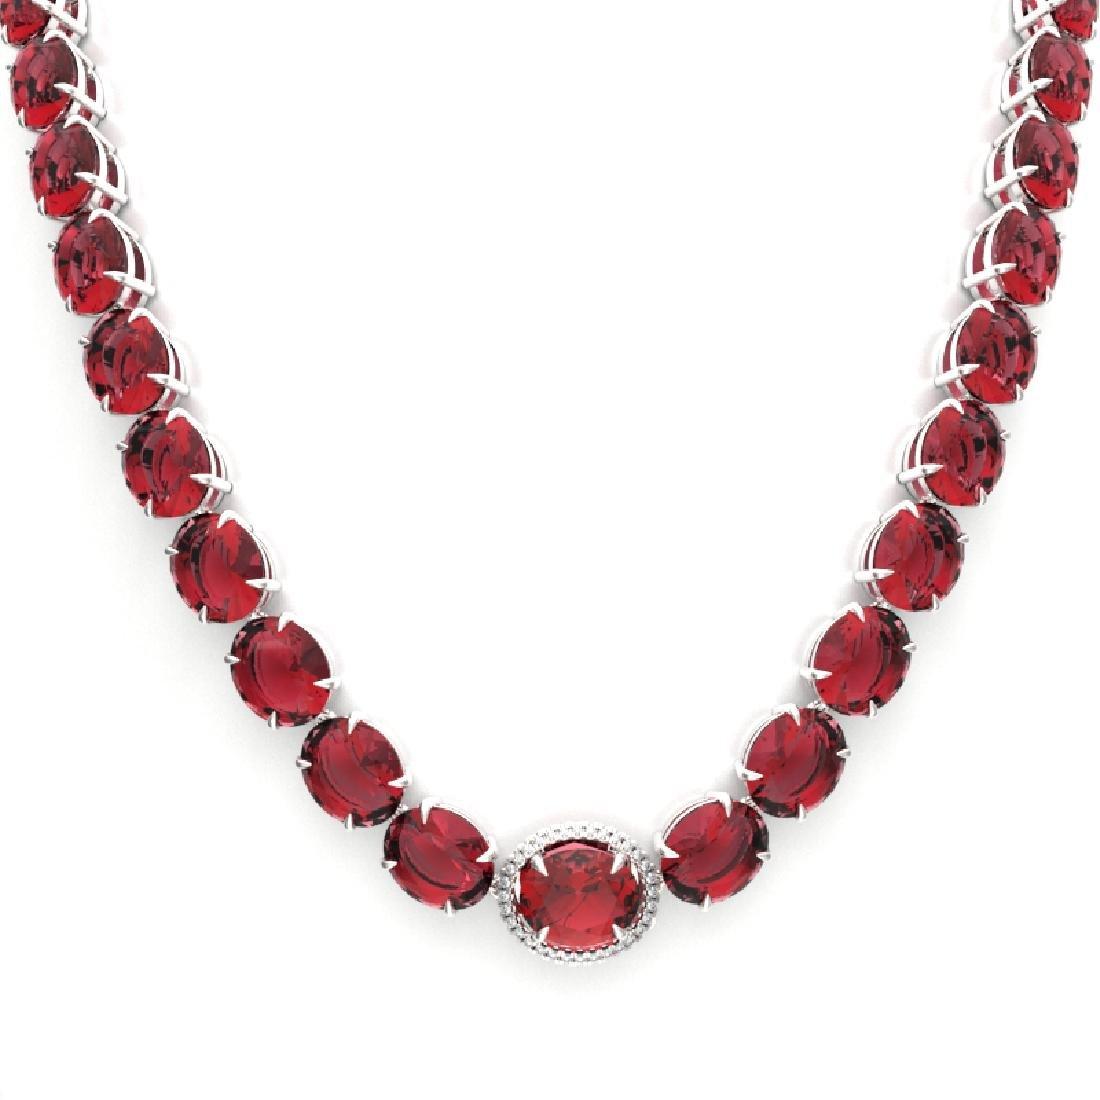 145 CTW Pink Tourmaline & VS/SI Diamond Necklace 14K - 2